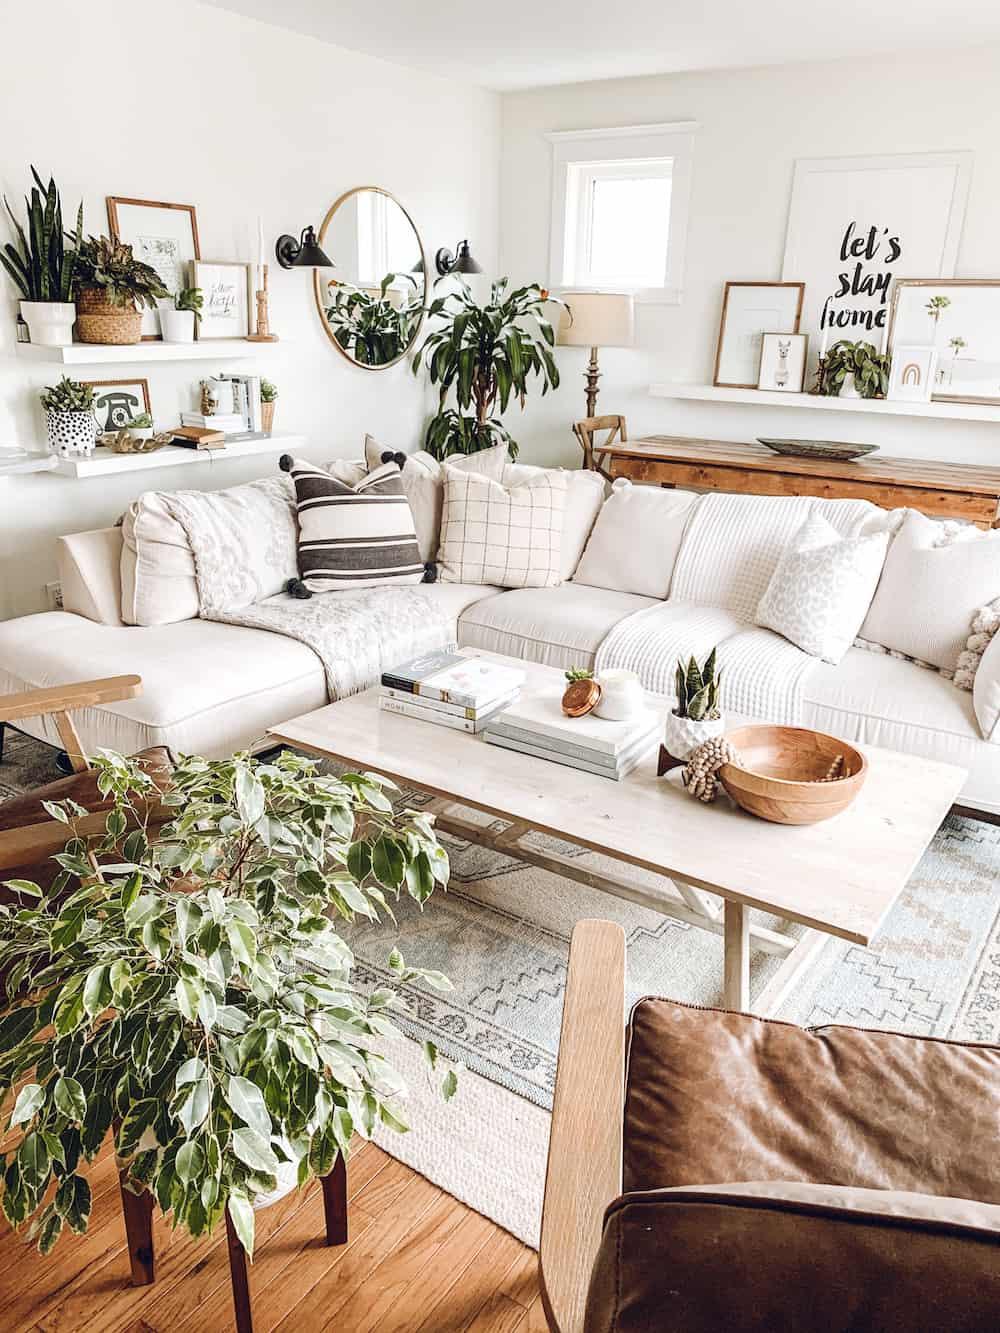 Neutral Boho Living Room Decor Tour 2020 - The Beauty Revival